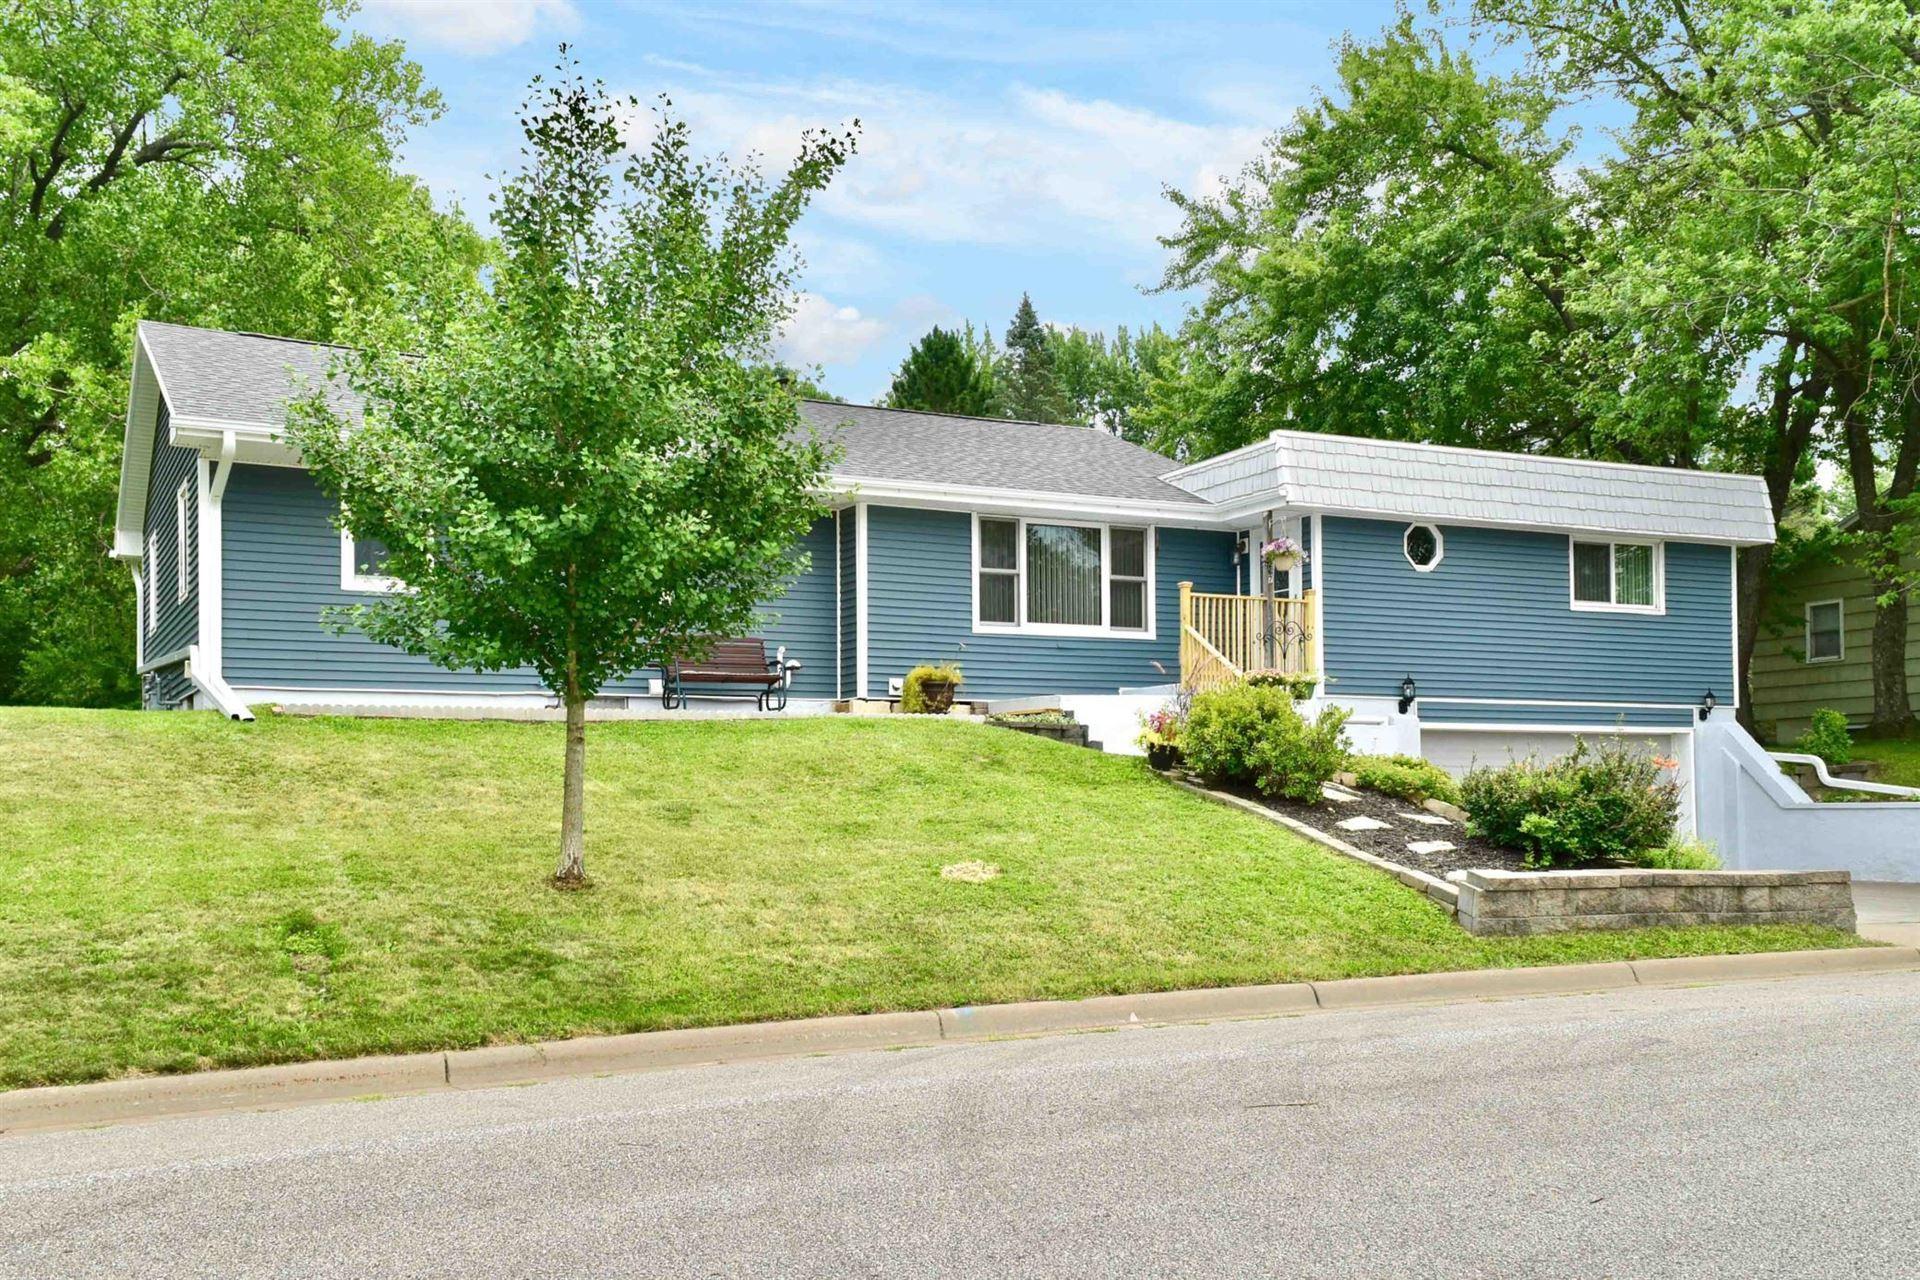 1267 Wincrest Drive, Winona, MN 55987 - MLS#: 6070619